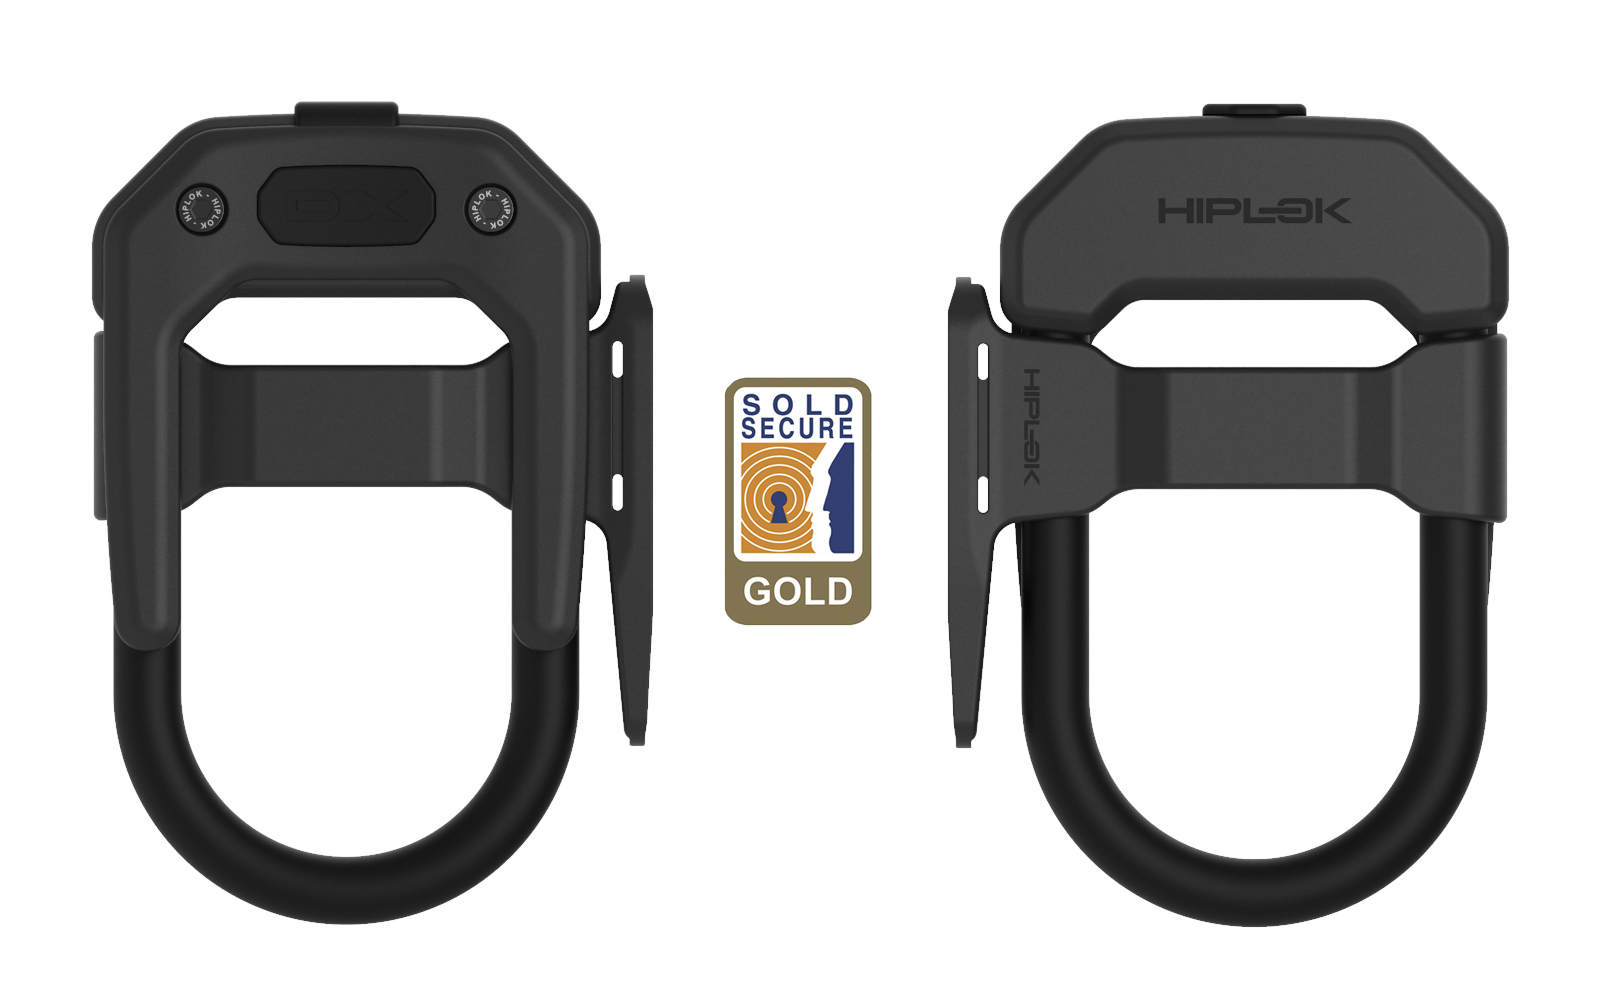 Hiplok DXF - Sold Secure Gold geprüftes DX Bügelschloss